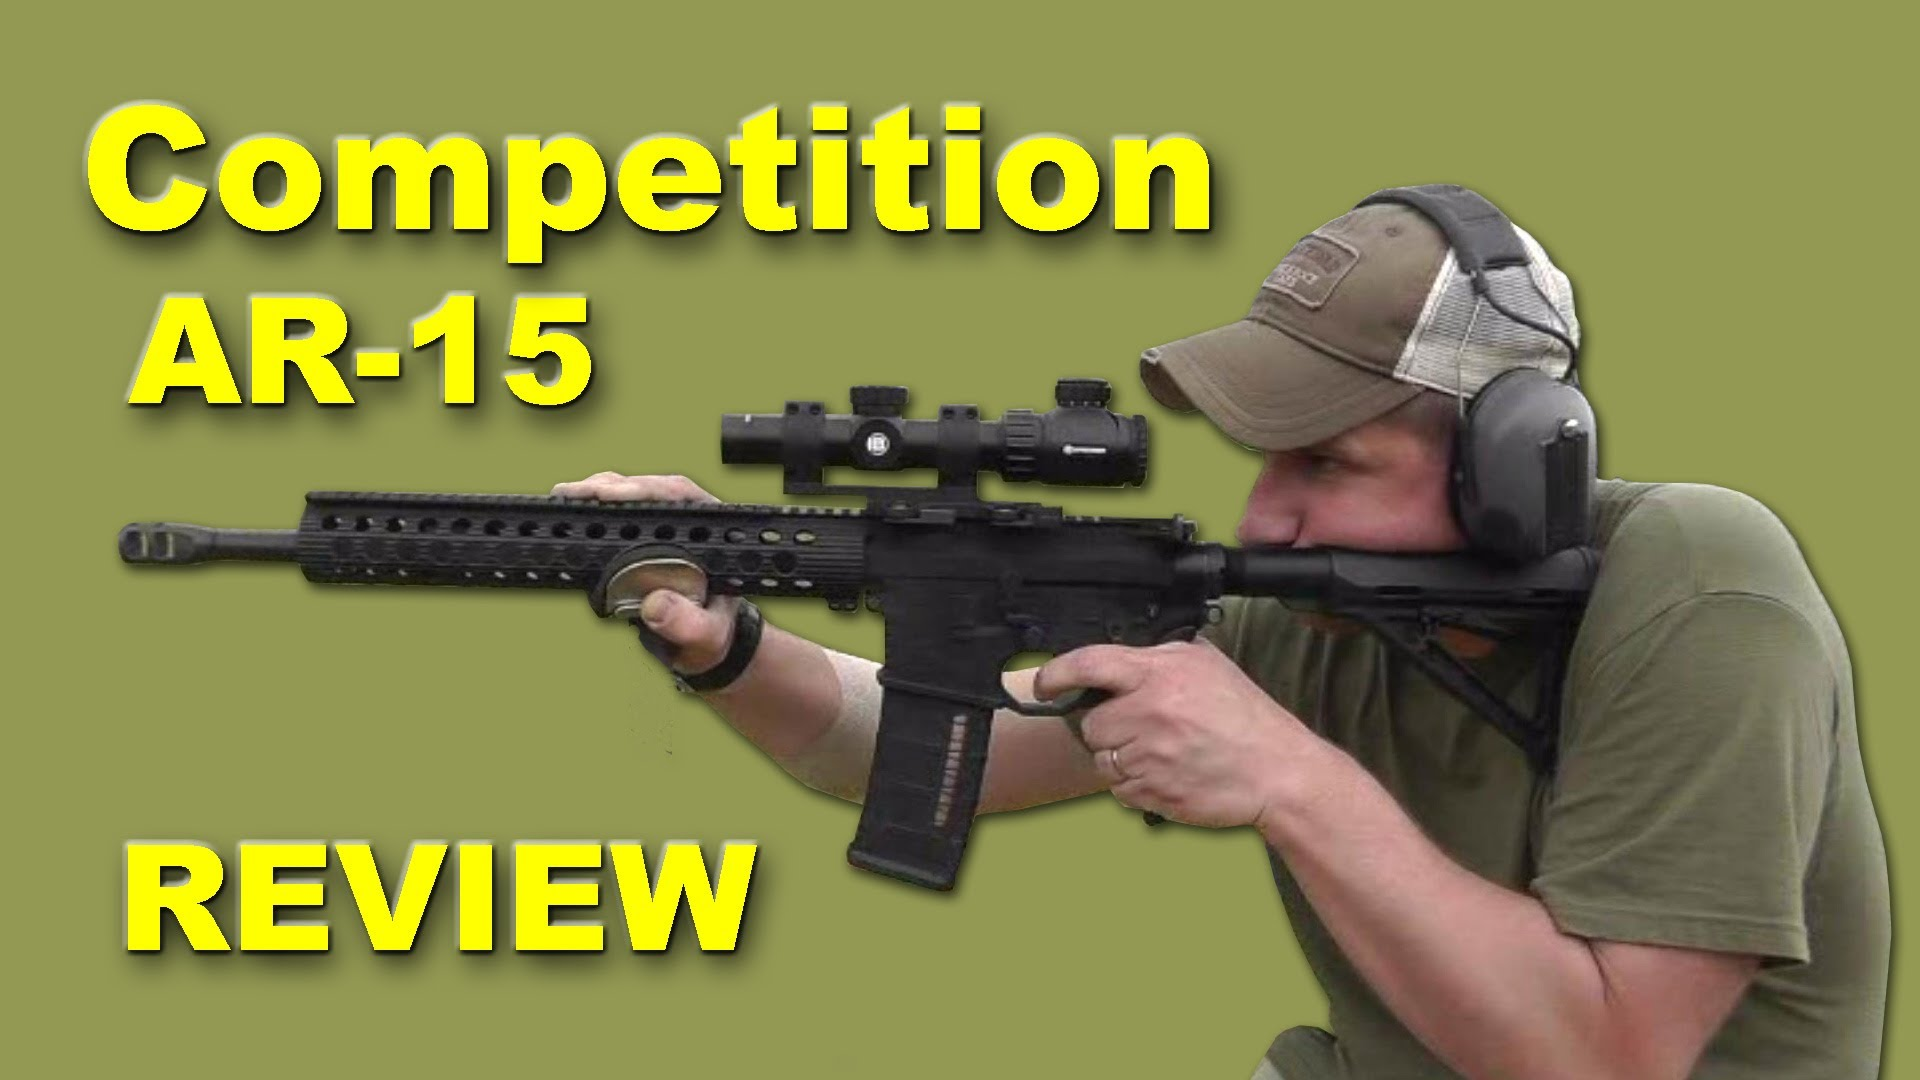 AR-15 Competition Rifle Review - Custom 3-Gun Rifle